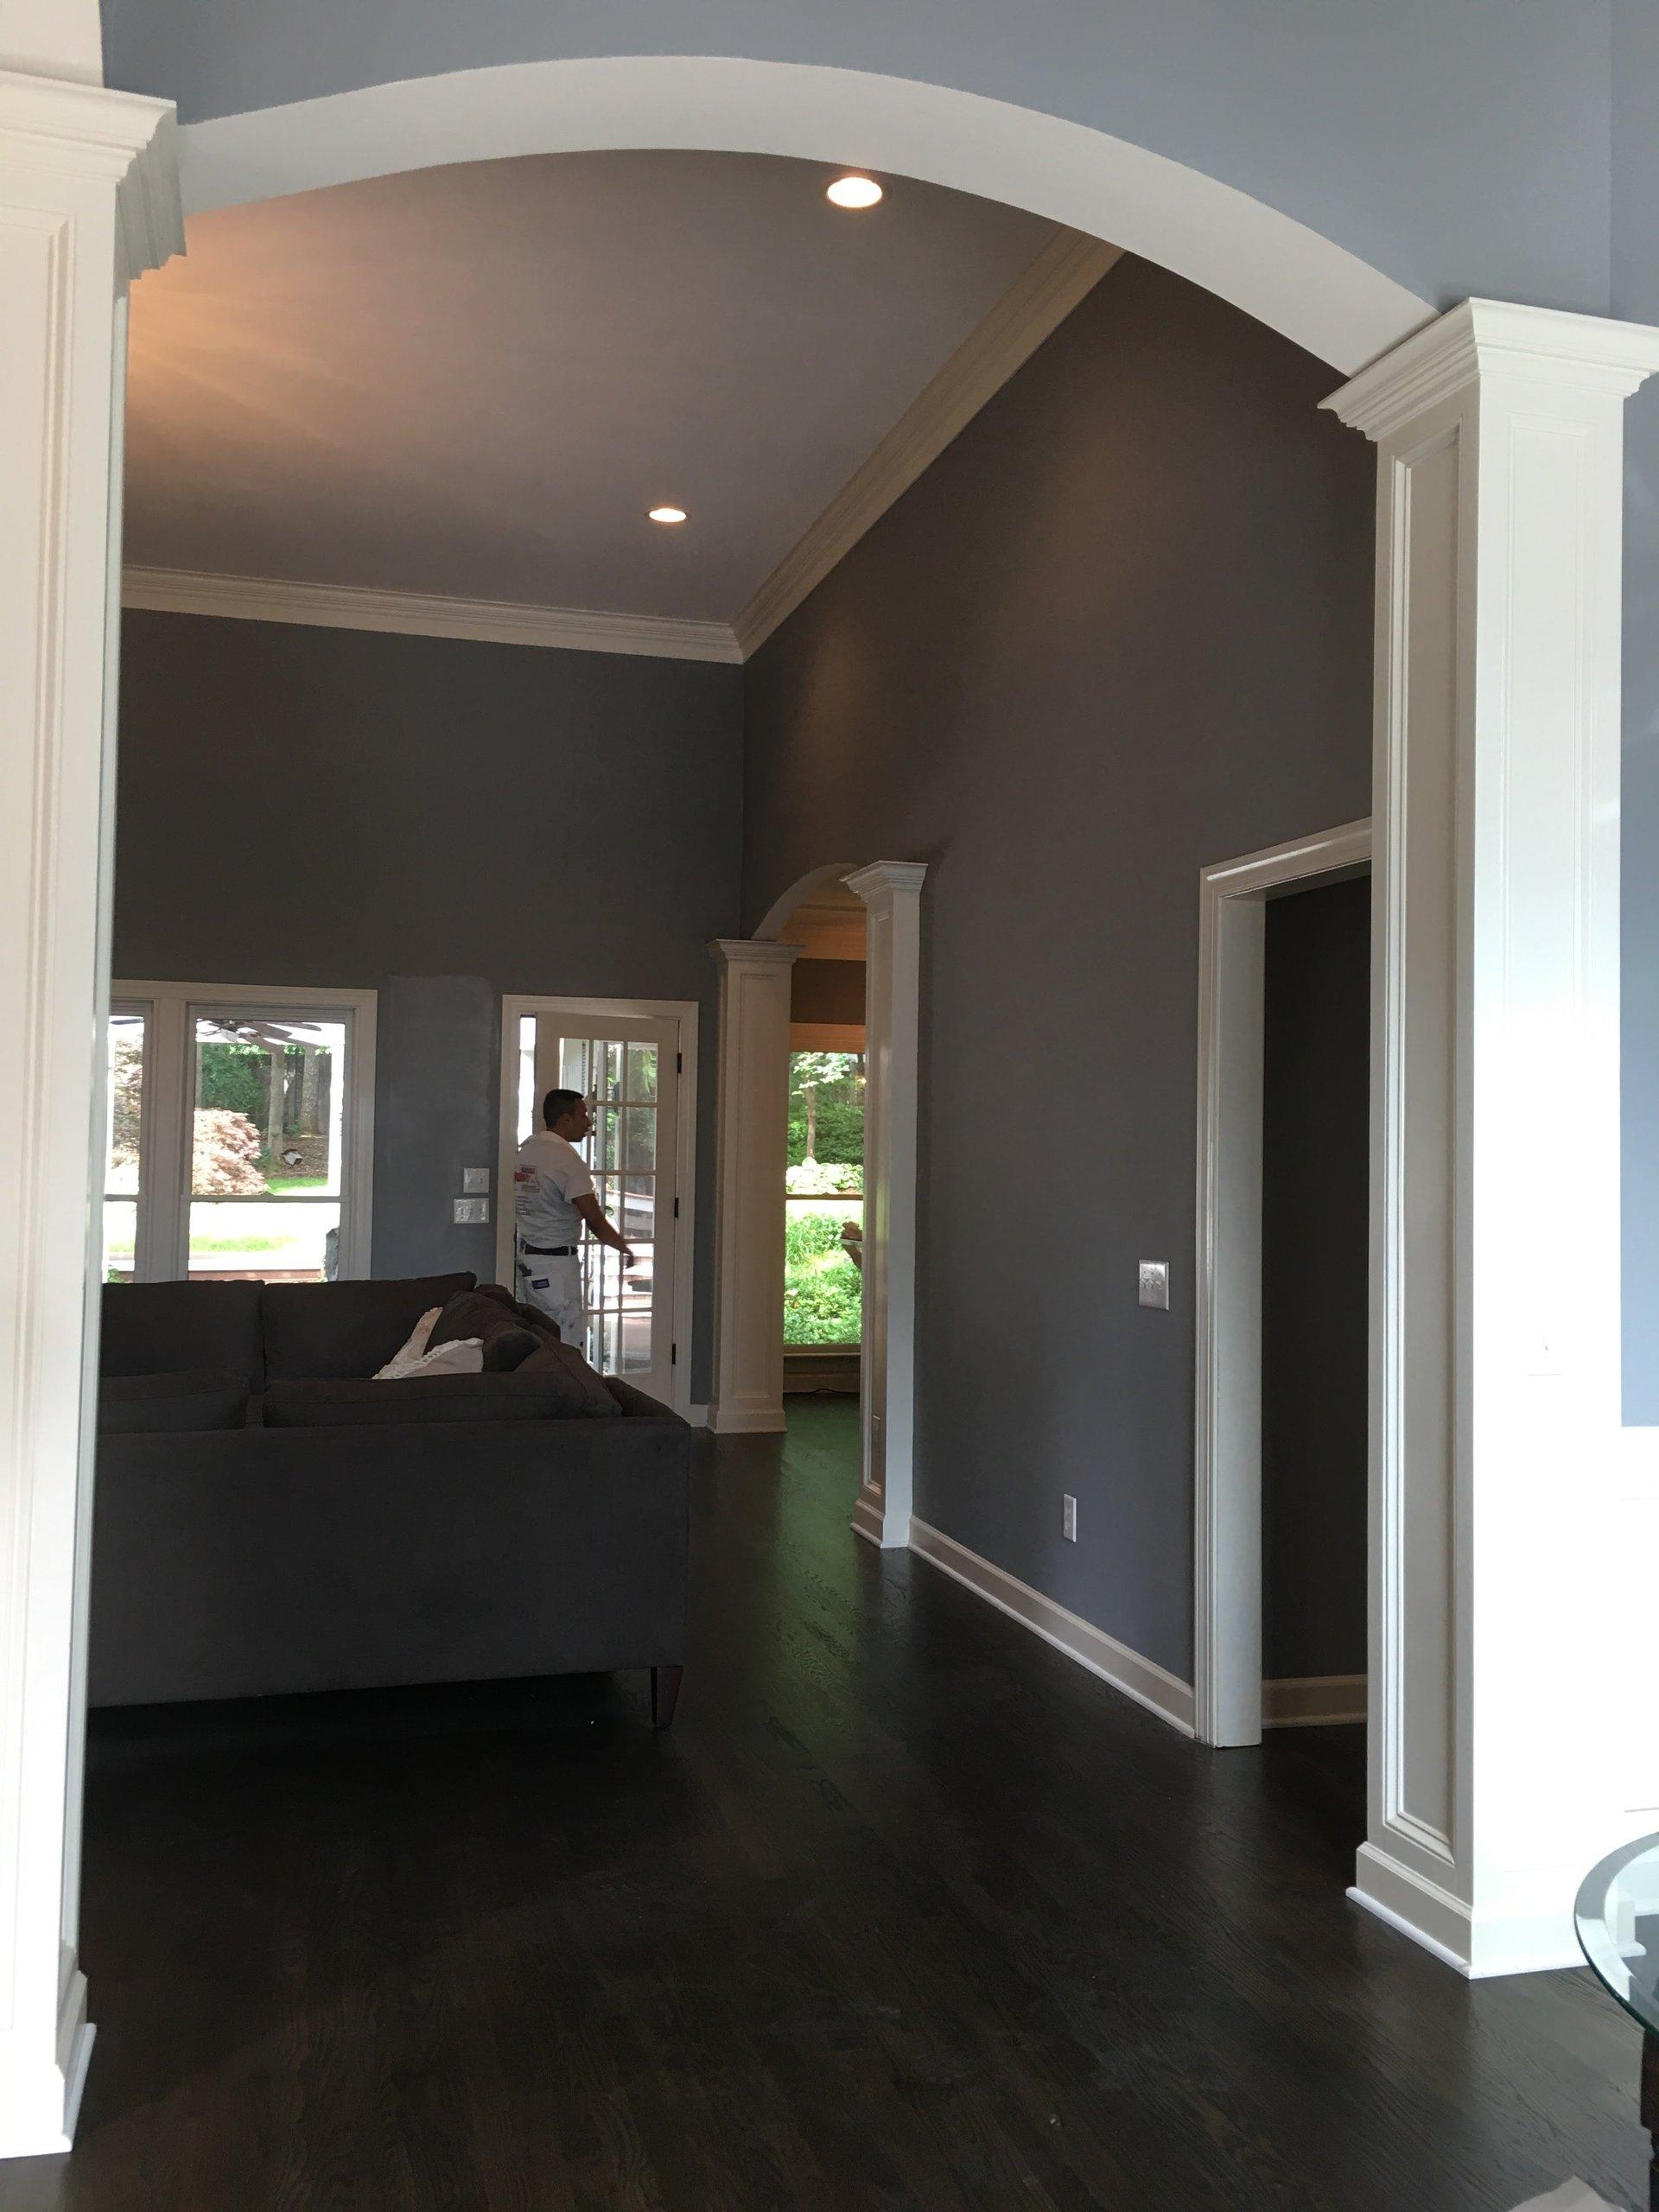 Residential Painting Company Greensboro NC